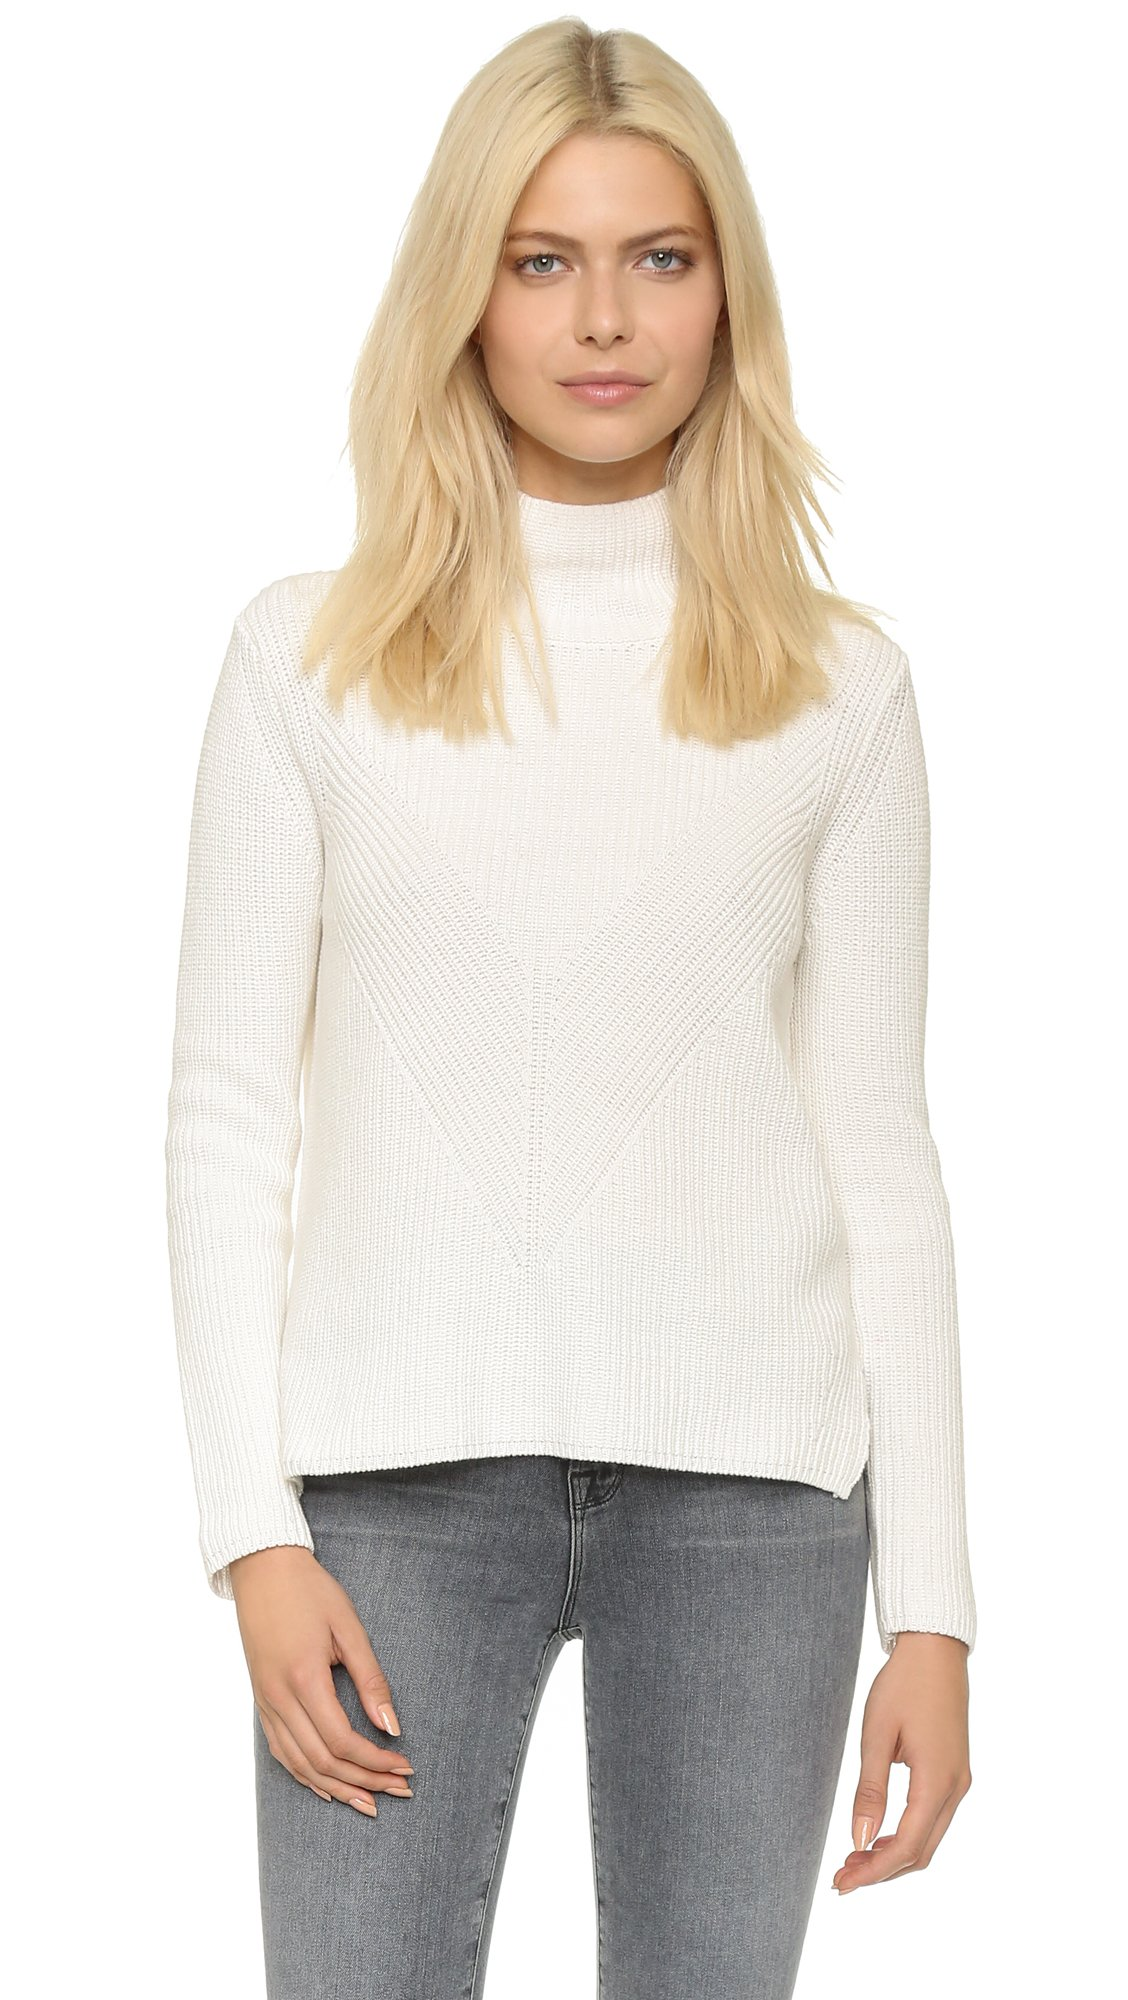 525 america Shaker Mock Neck Sweater - Olive Moss in White | Lyst